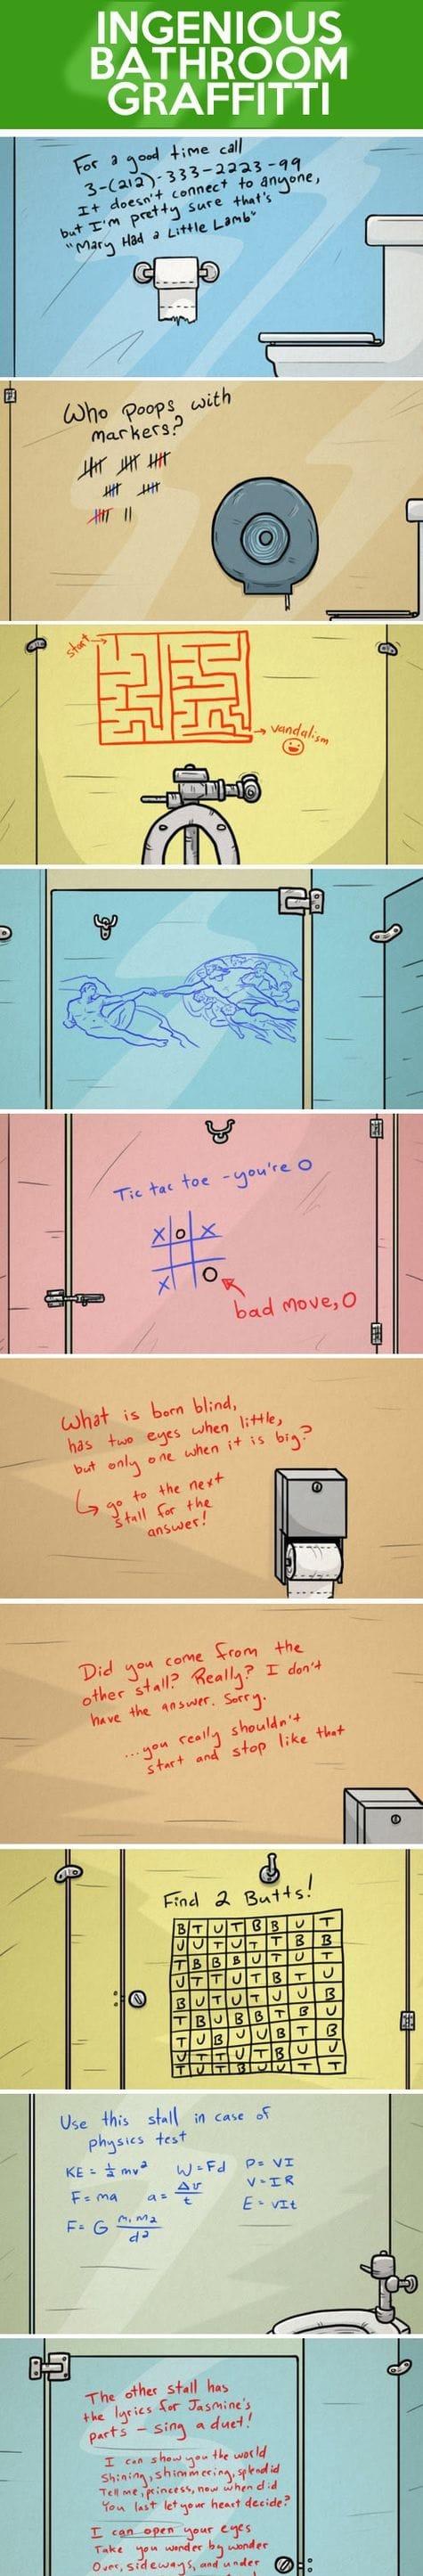 ingenious-bathroom-graffiti